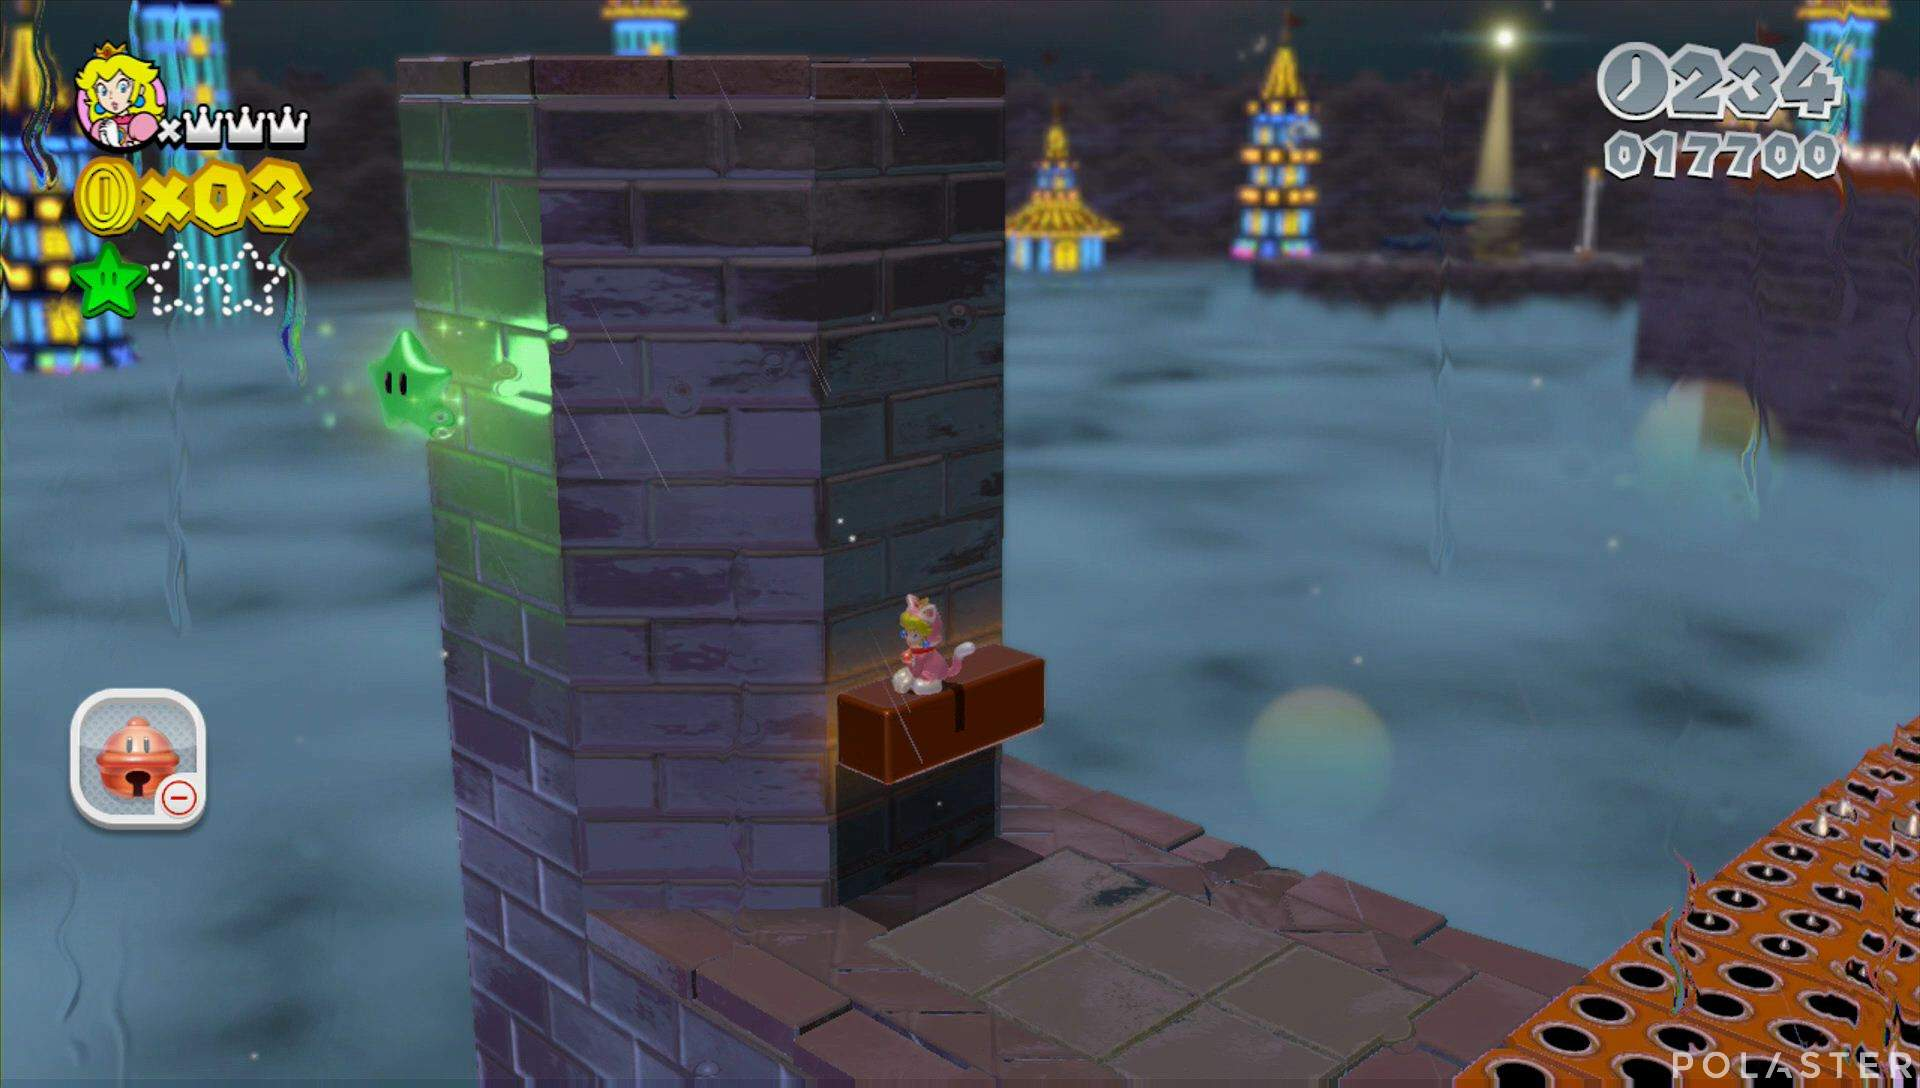 Super Mario 3D World Mundo Flor-11 Estrella 2